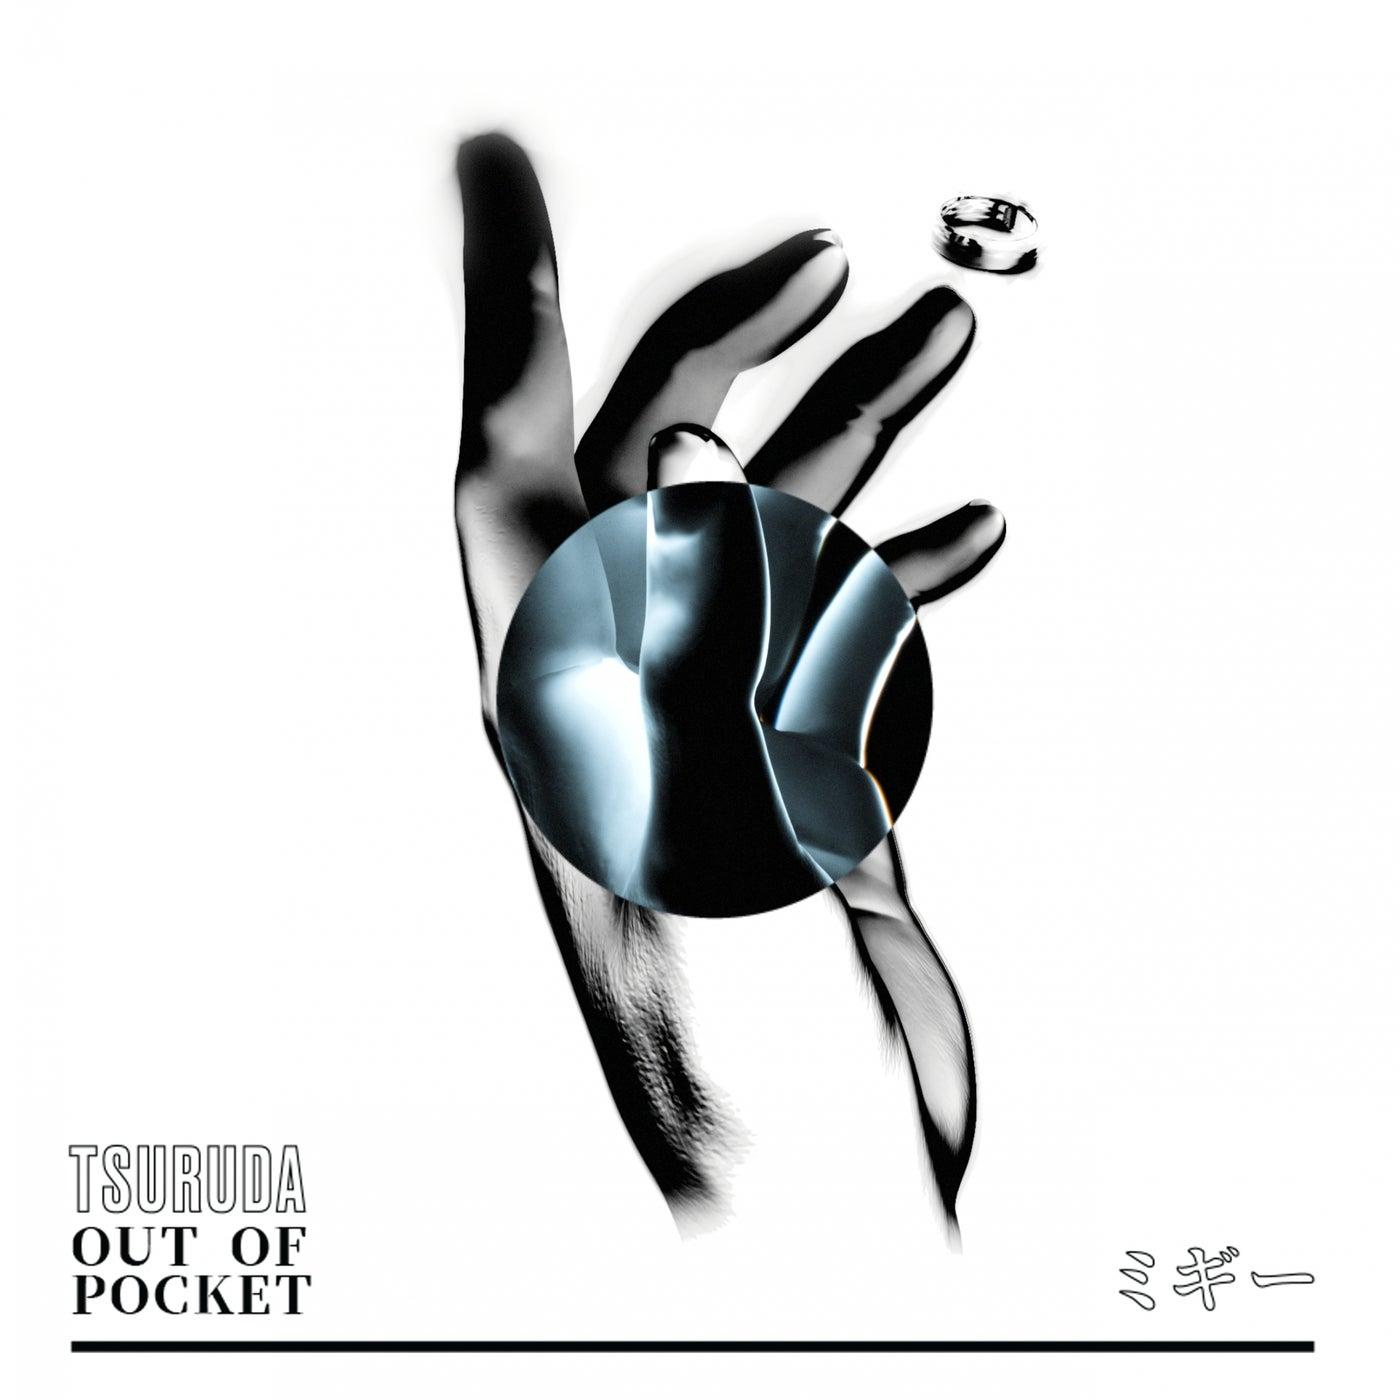 Out of Pocket (Original Mix)